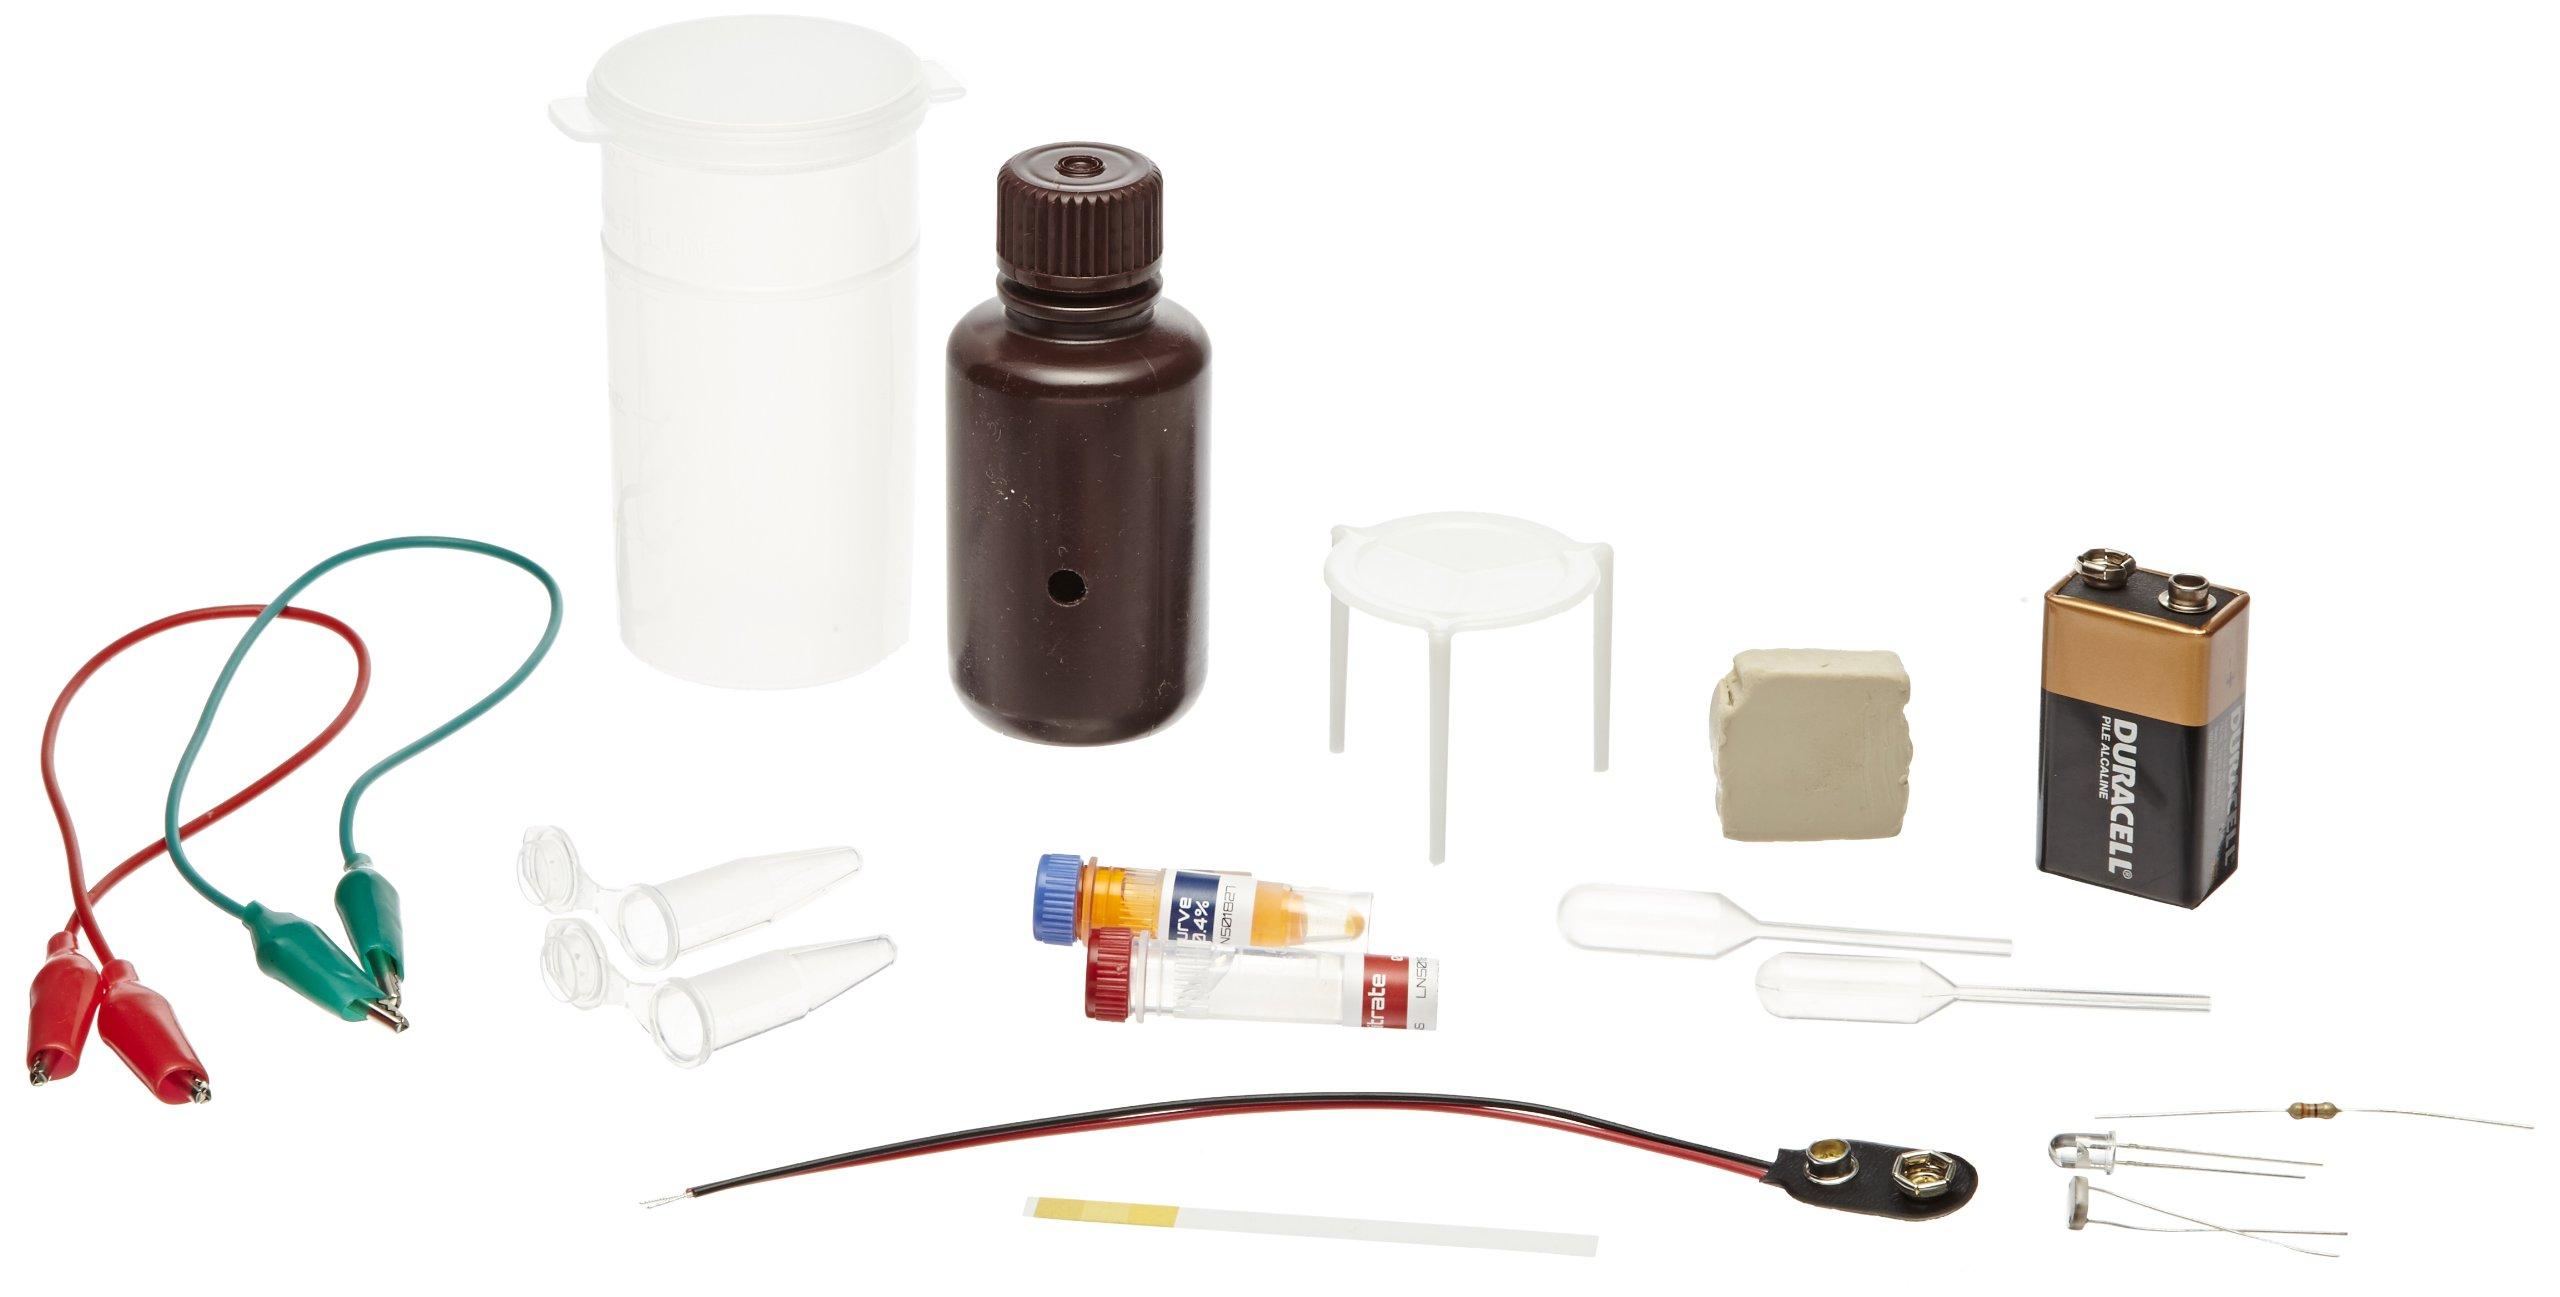 Desolation: STEM Series - Urine Trouble: Water Purification Kit